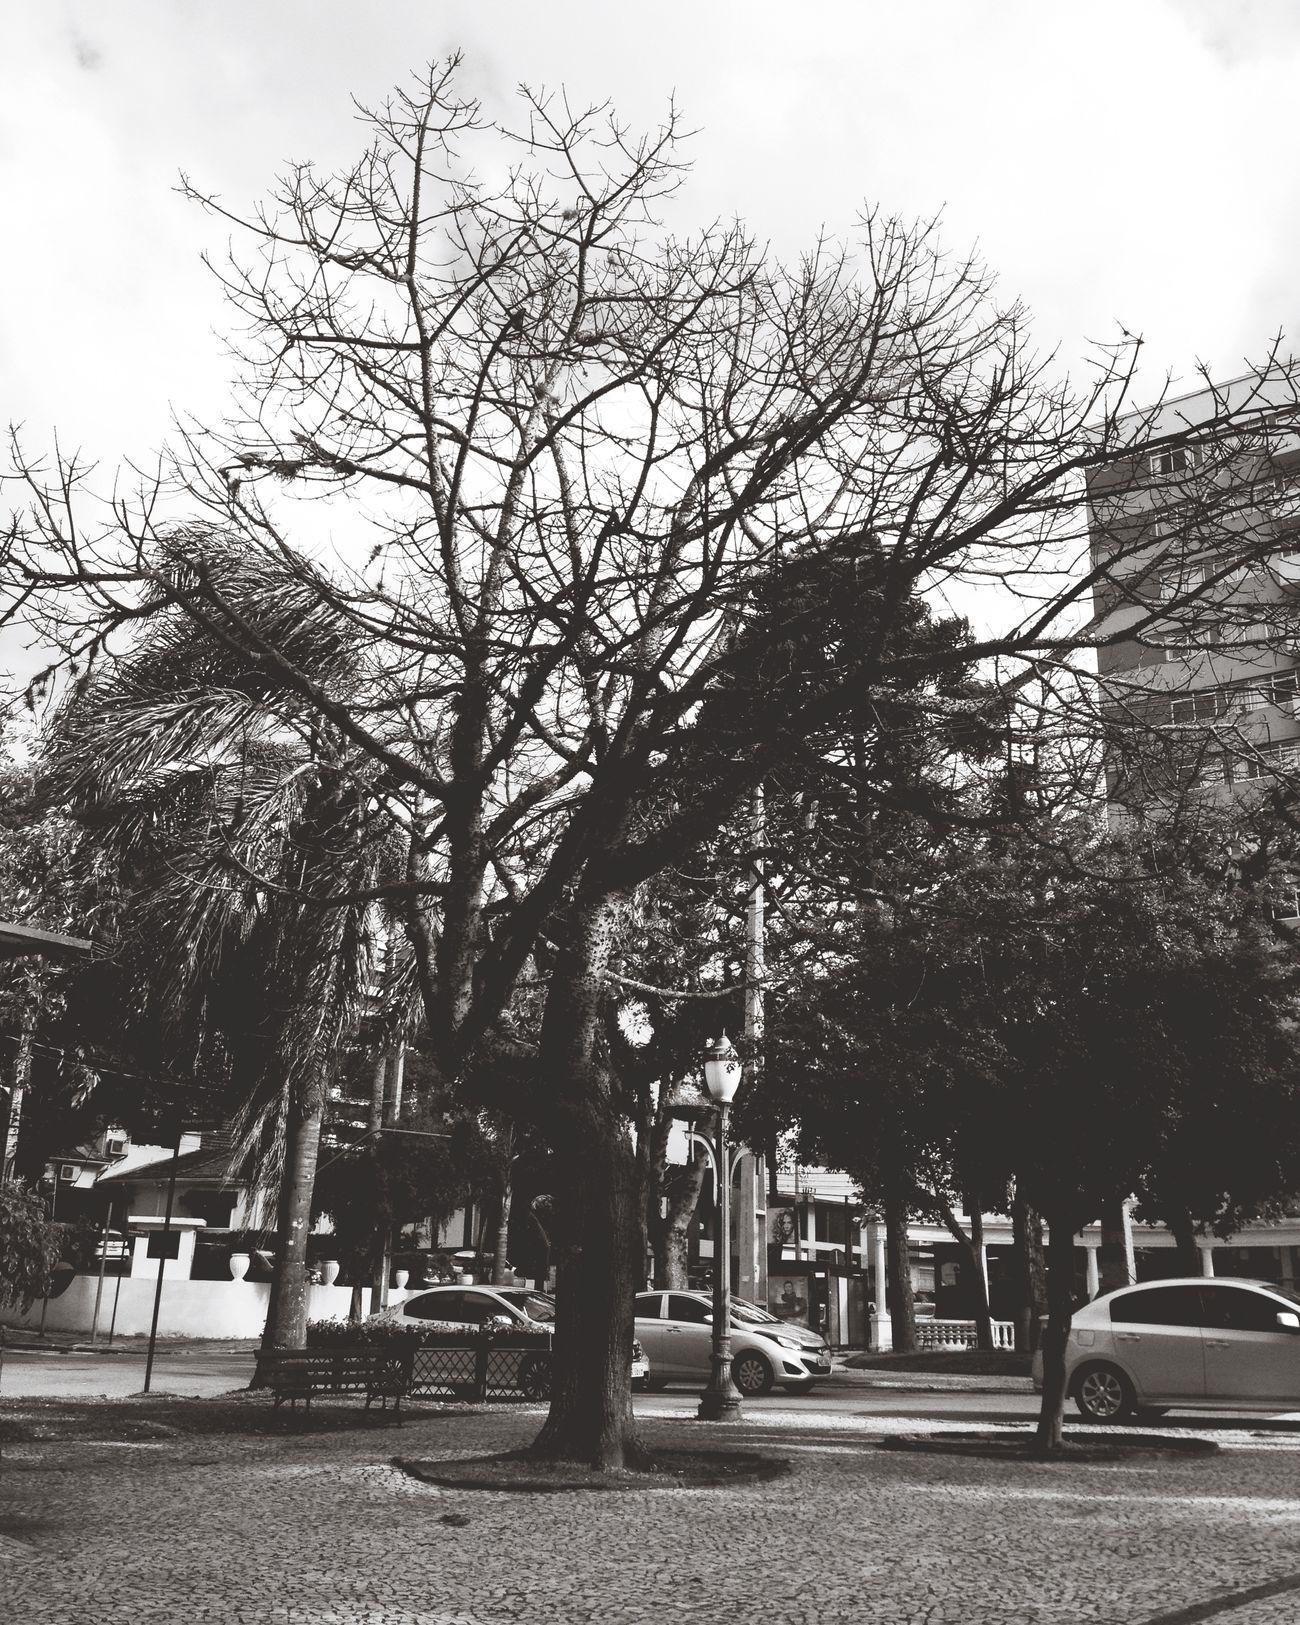 Vem chuva Curitiba Batel Brasil Brazil